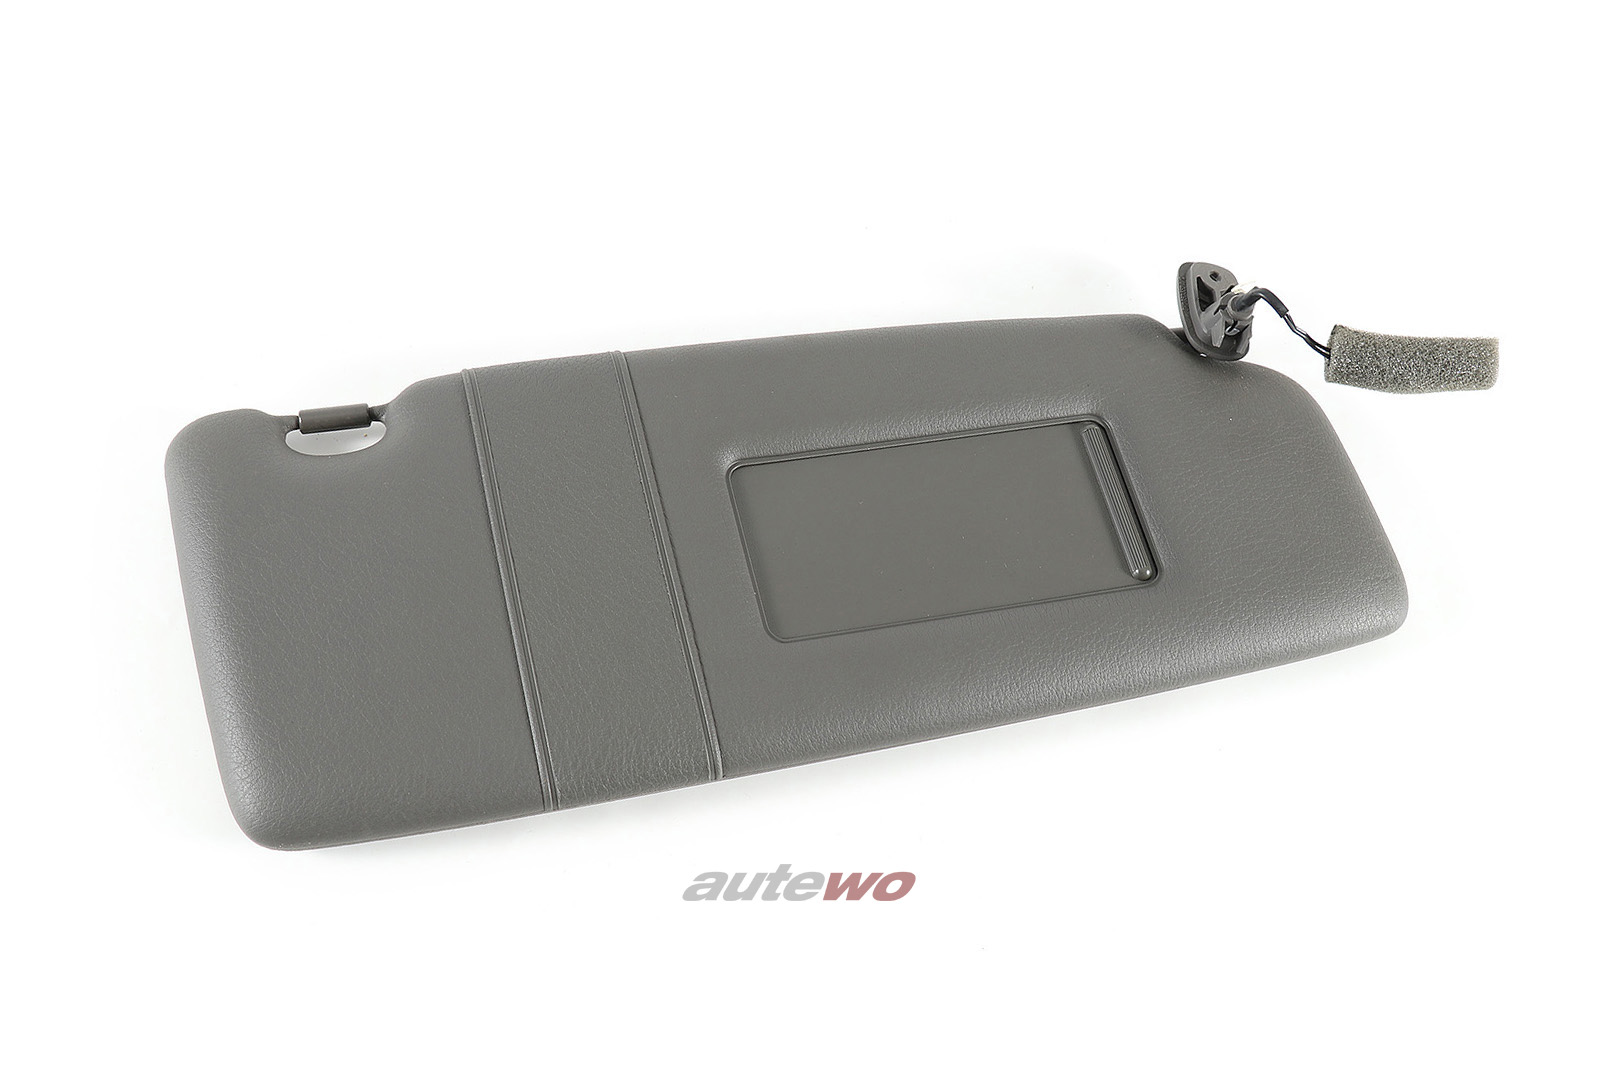 8H0857552H NEU Audi A4/S4/RS4 Cabrio 8H Sonnenblende + Spiegel Rechts